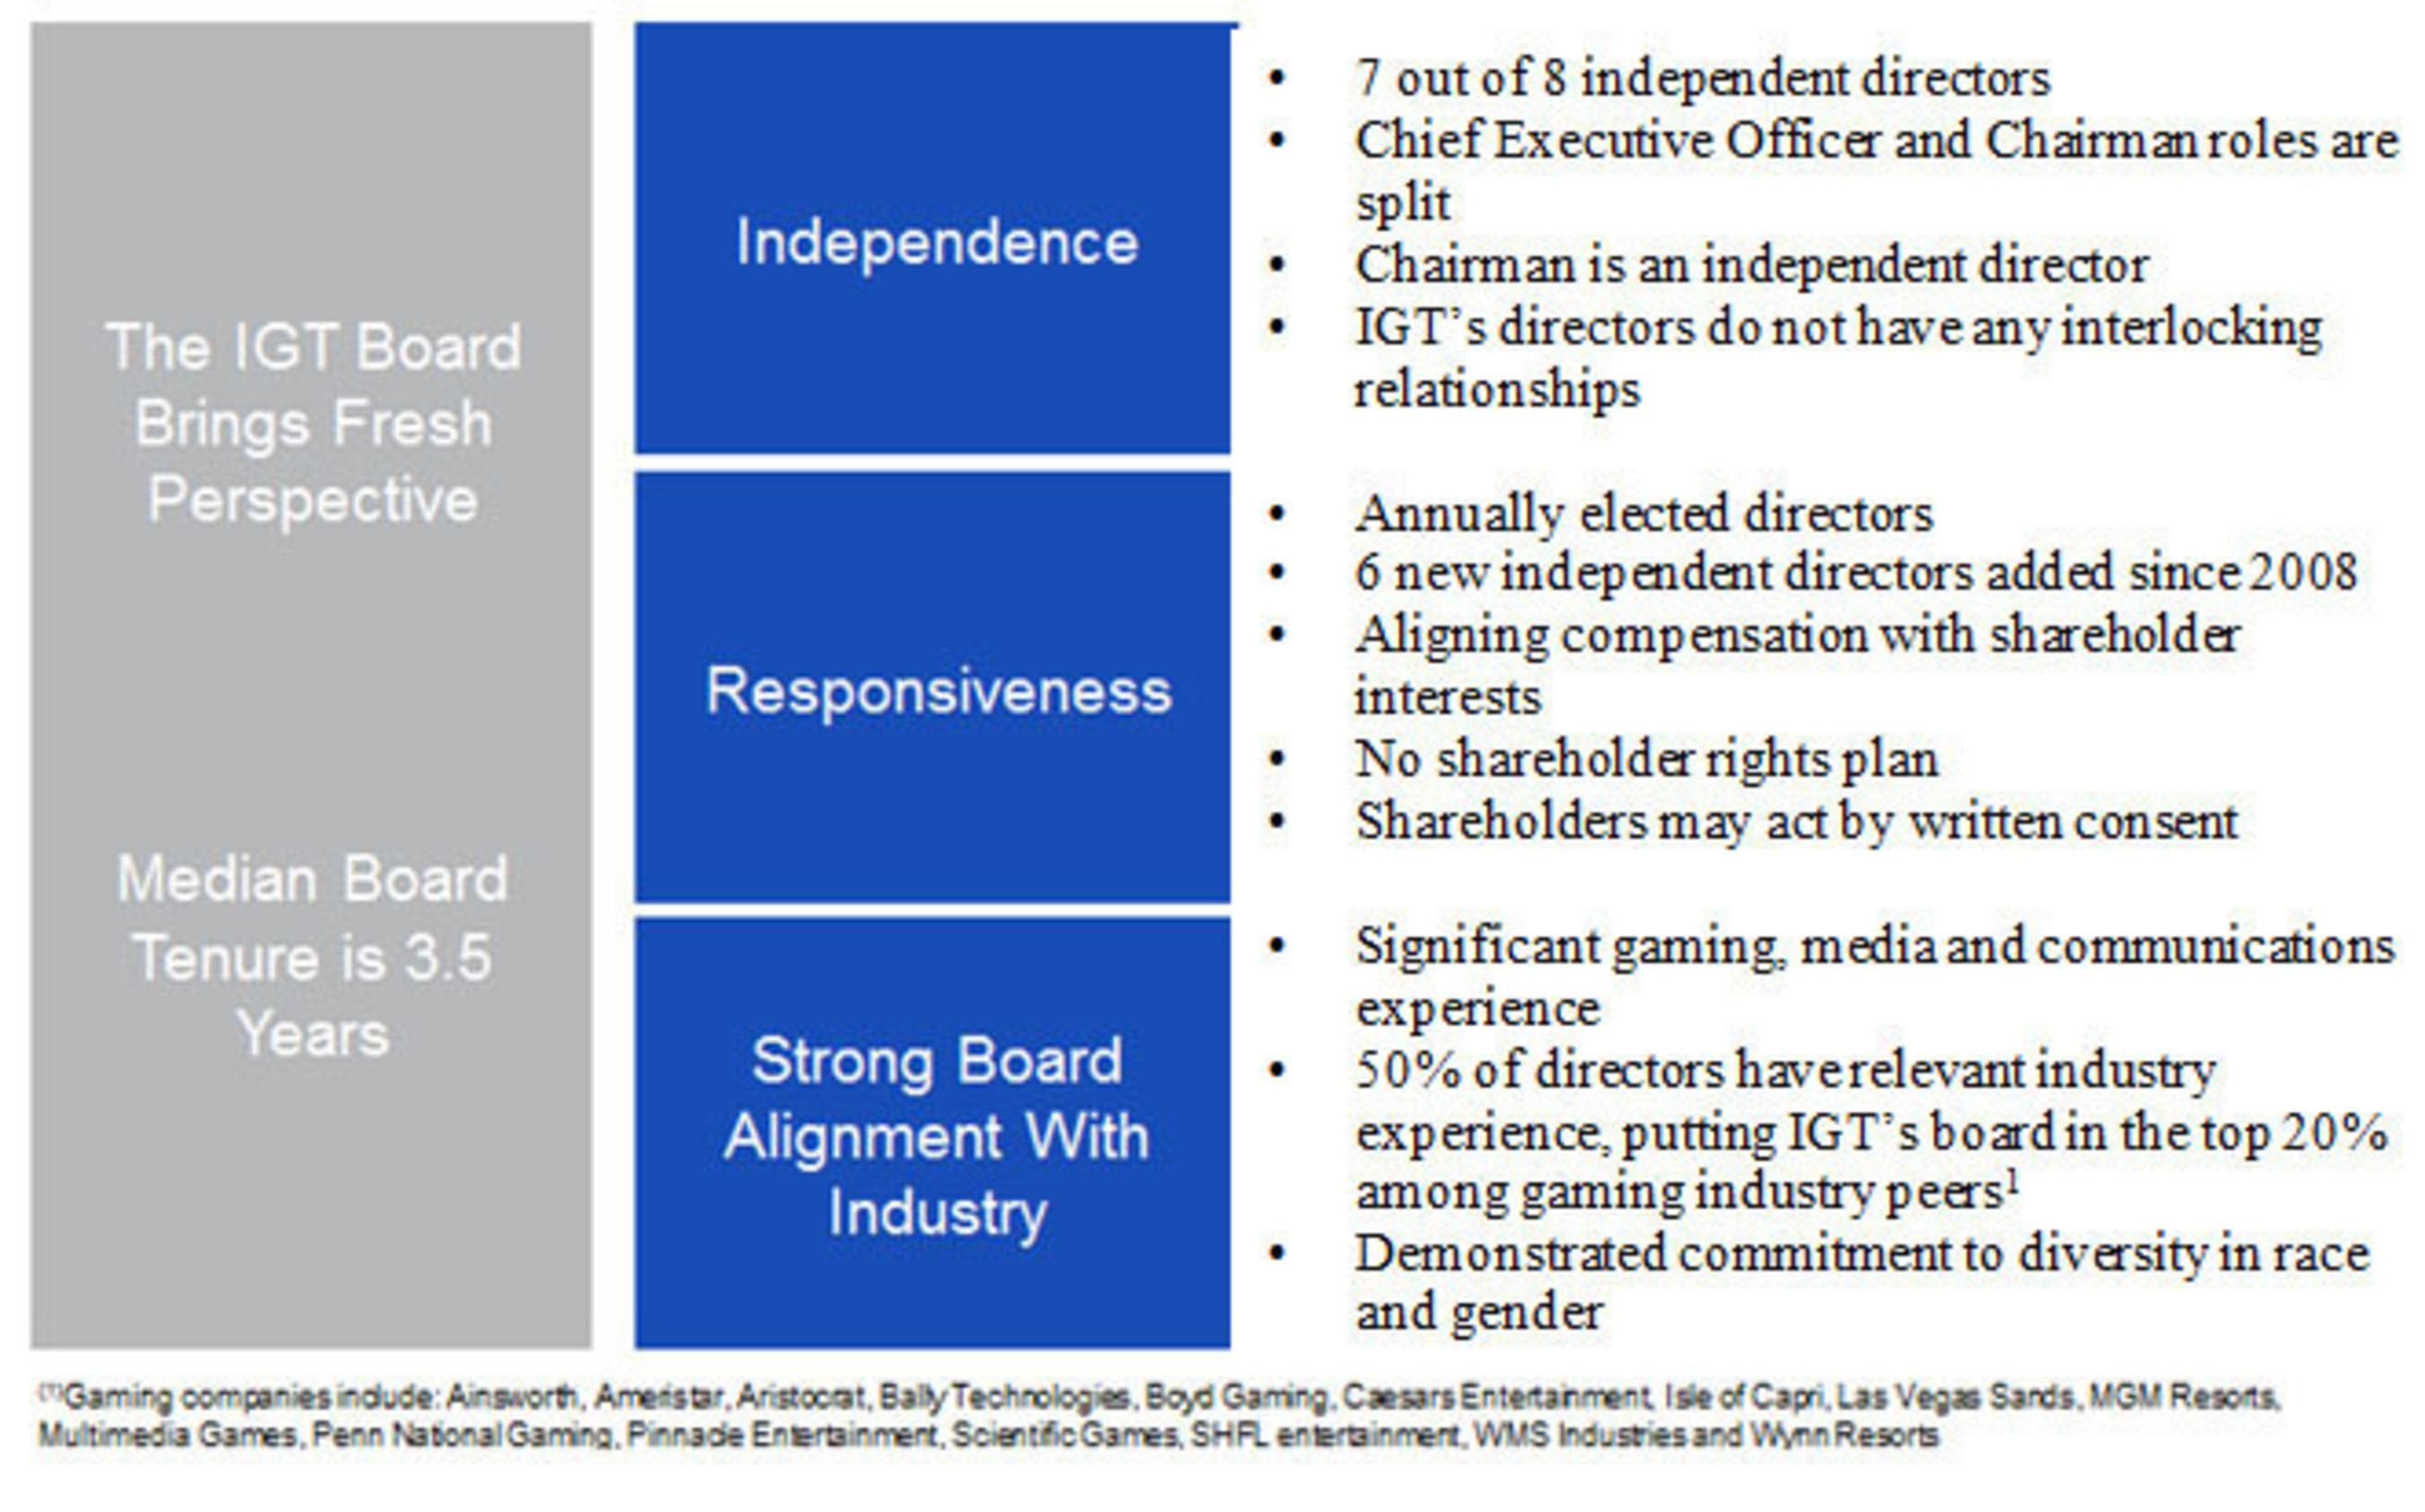 IGT Offers a Shareholder-Friendly Governance Structure. (PRNewsFoto/International Game Technology) (PRNewsFoto/INTERNATIONAL GAME TECHNOLOGY)